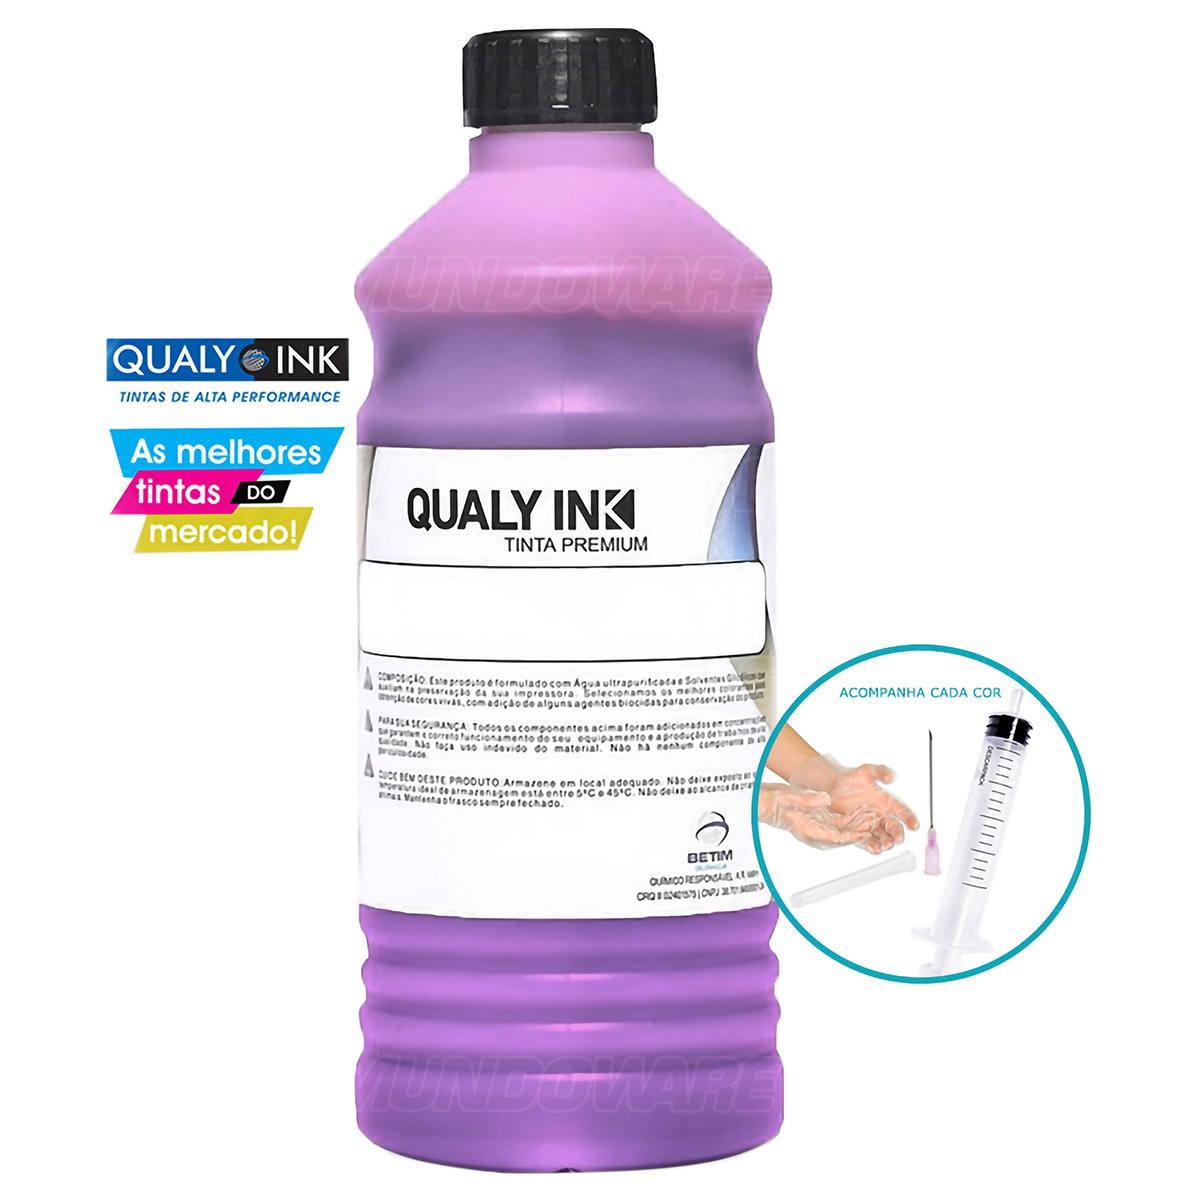 Compatível: Tinta Pigmentada Qualy-Ink MP3E-1534 Série 673 para Epson L800 L805 L810 L850 L1800 Magenta 1L